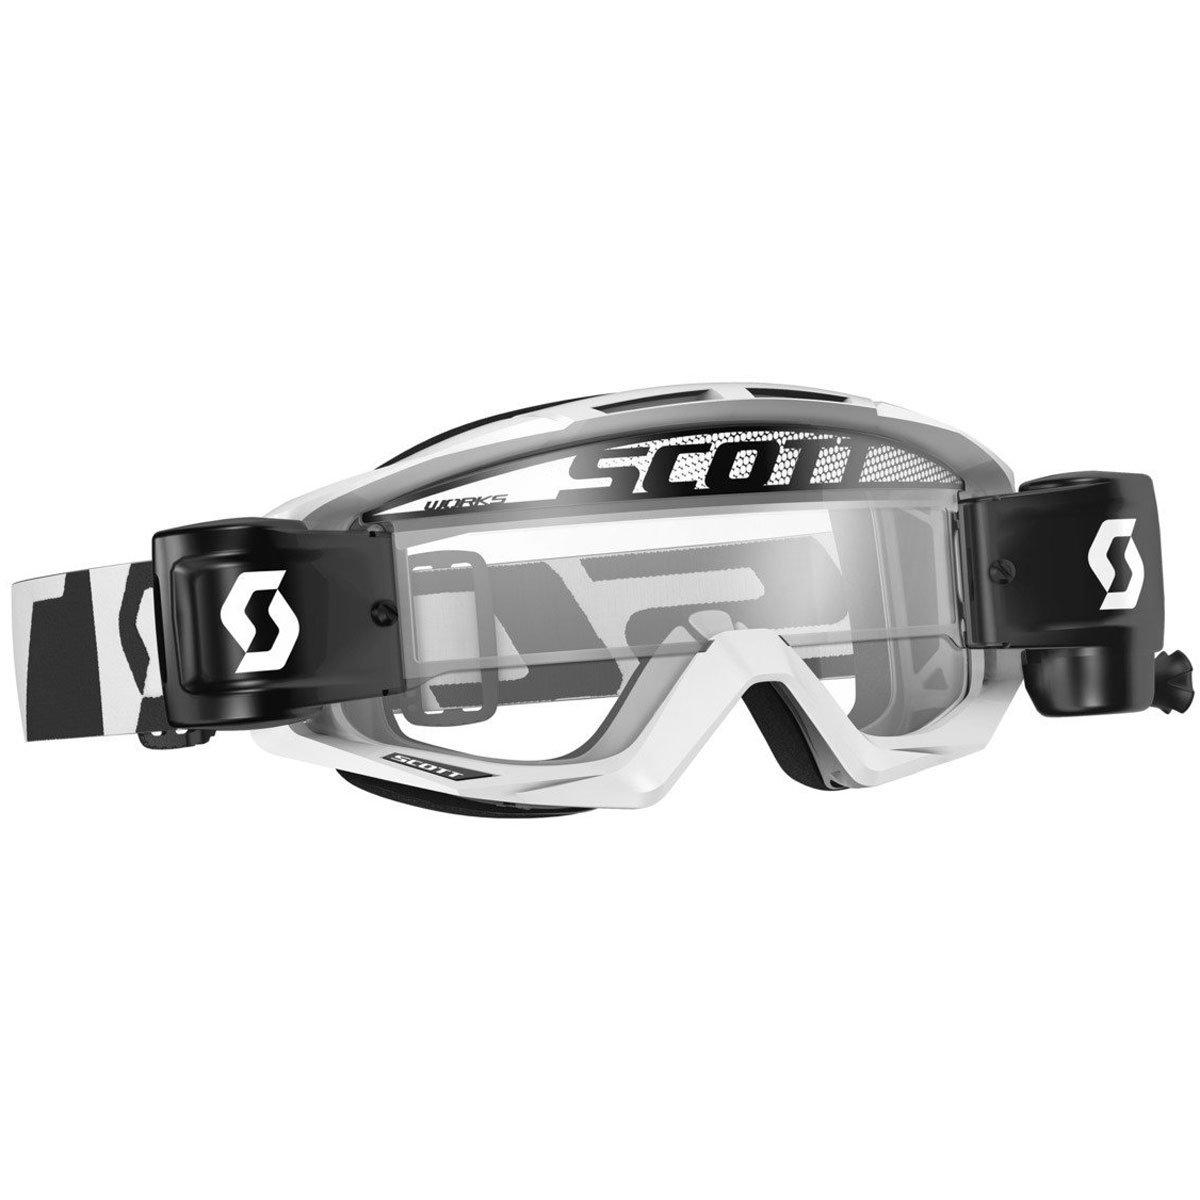 Scott Tyrant WFS Goggles - White/Clear - One Size by Scott Sports